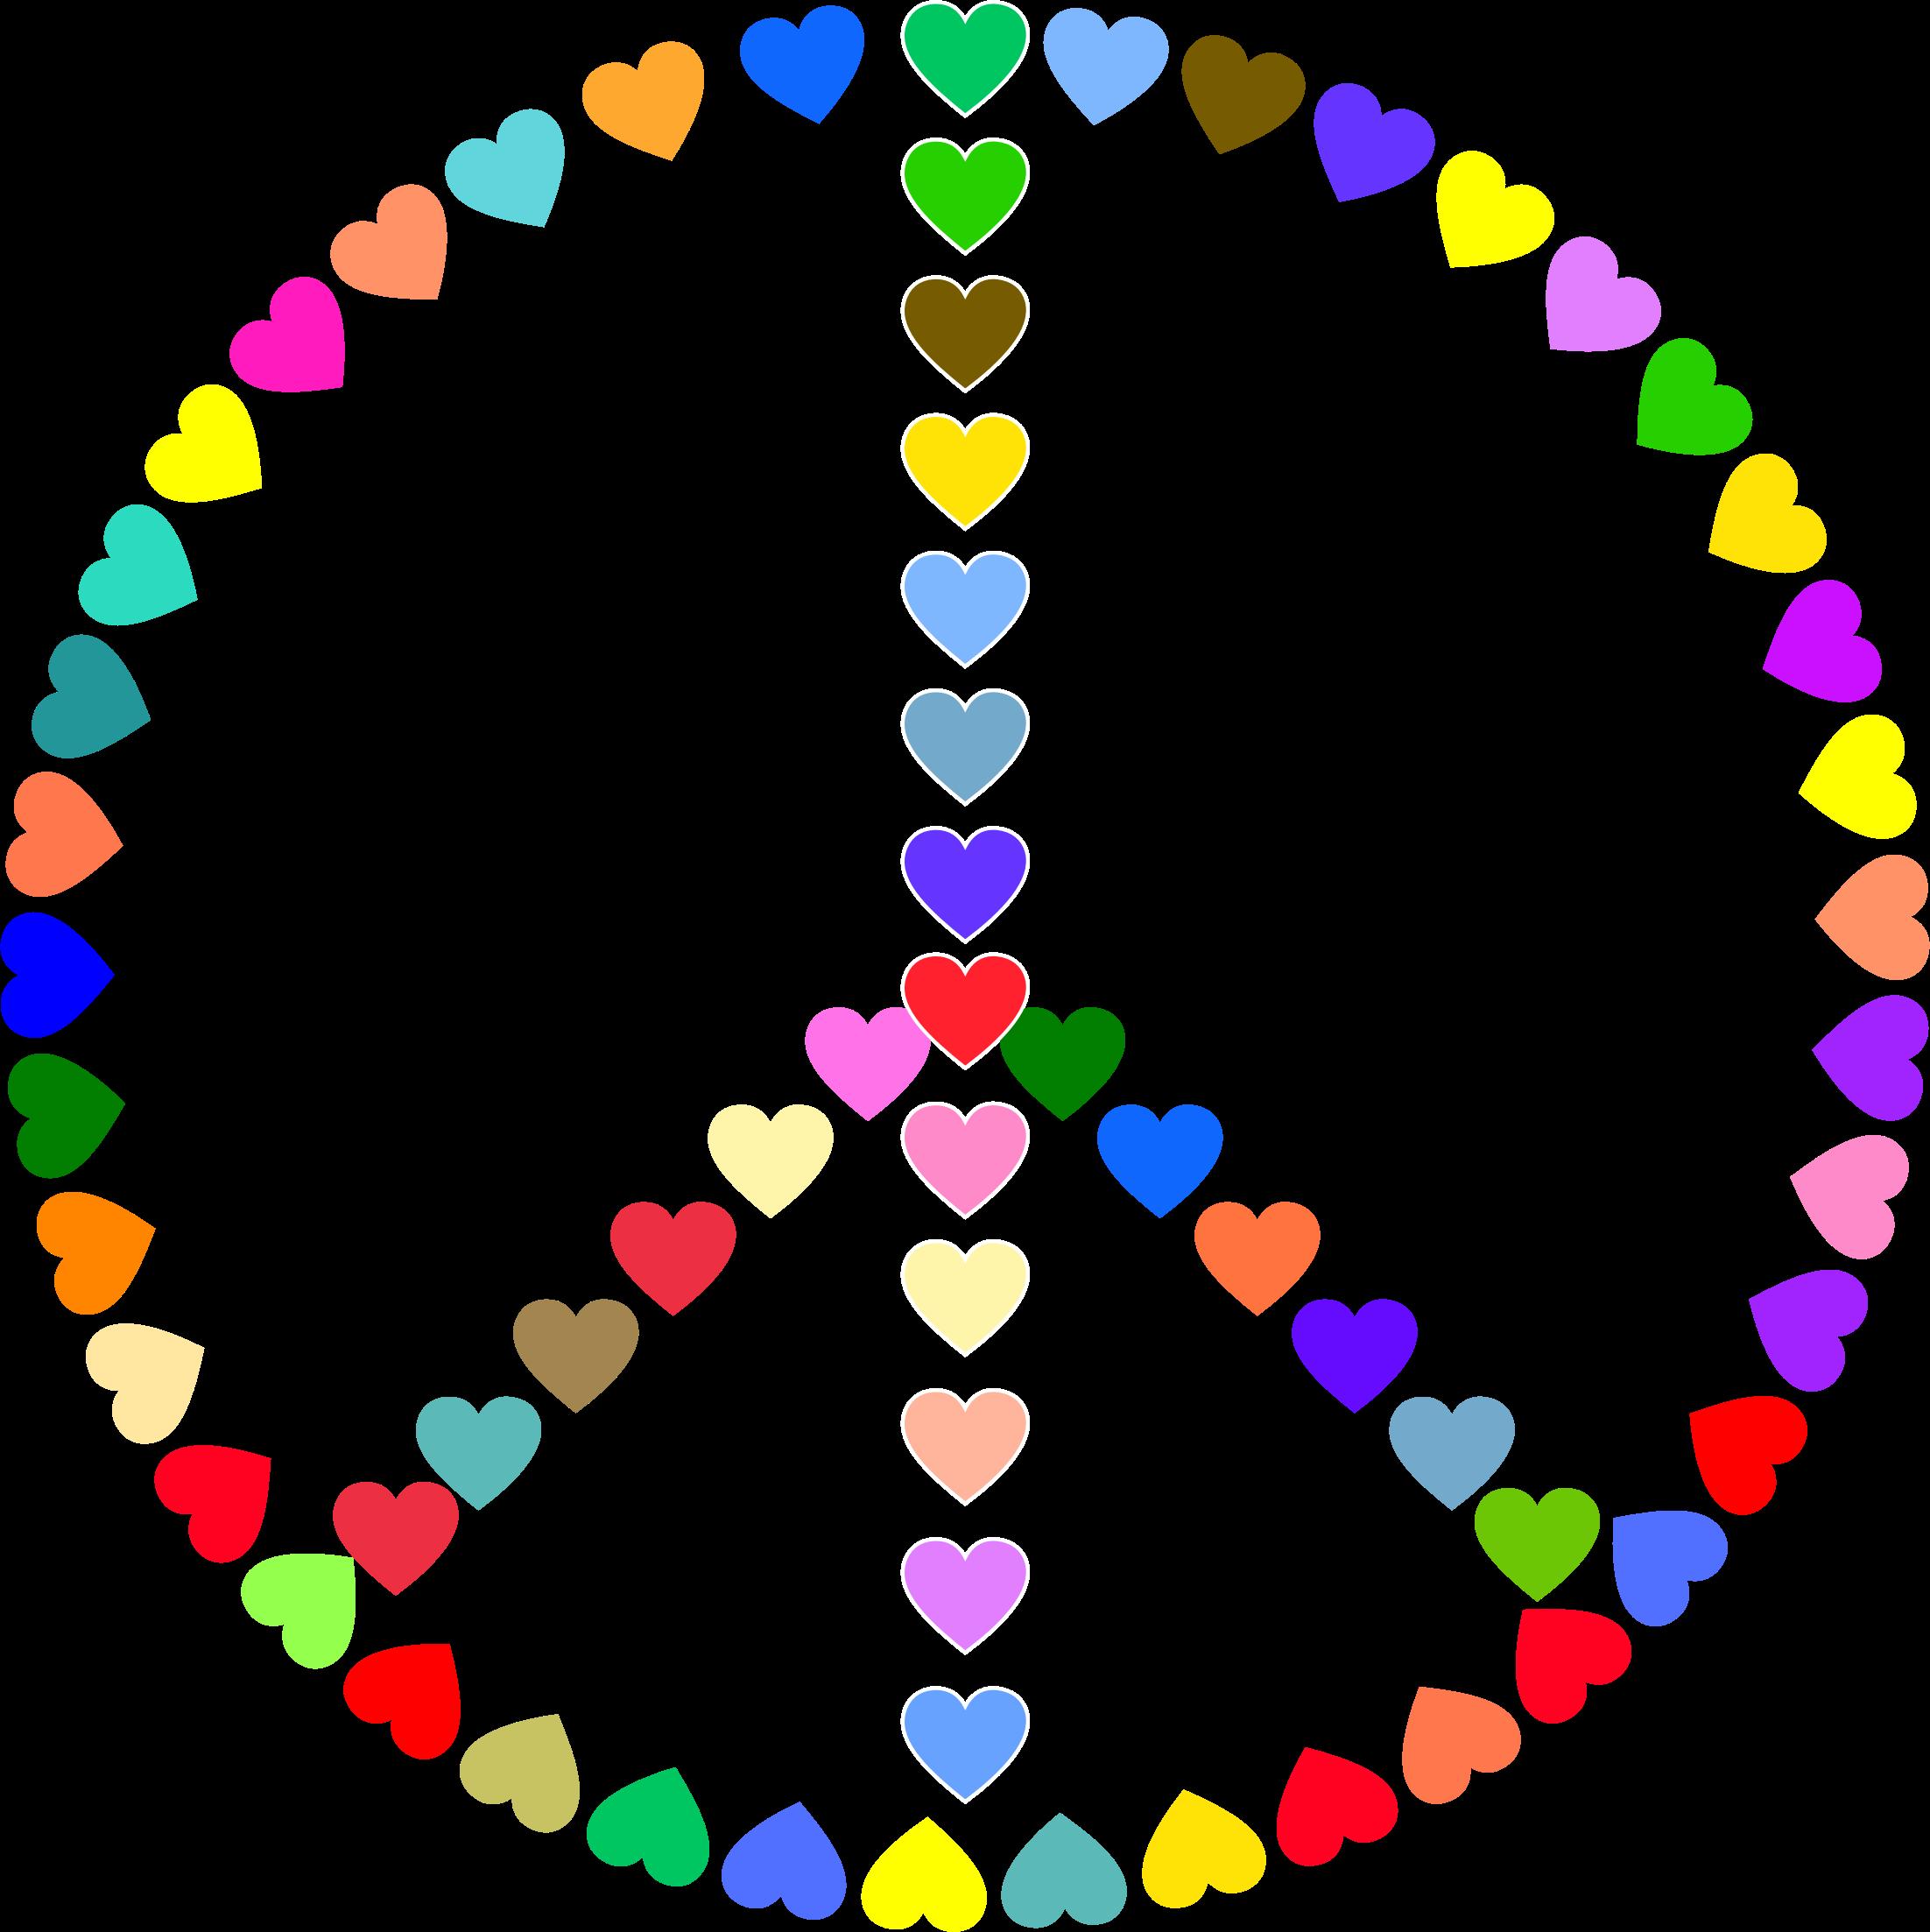 Love clipart logo. Colorful peace sign big